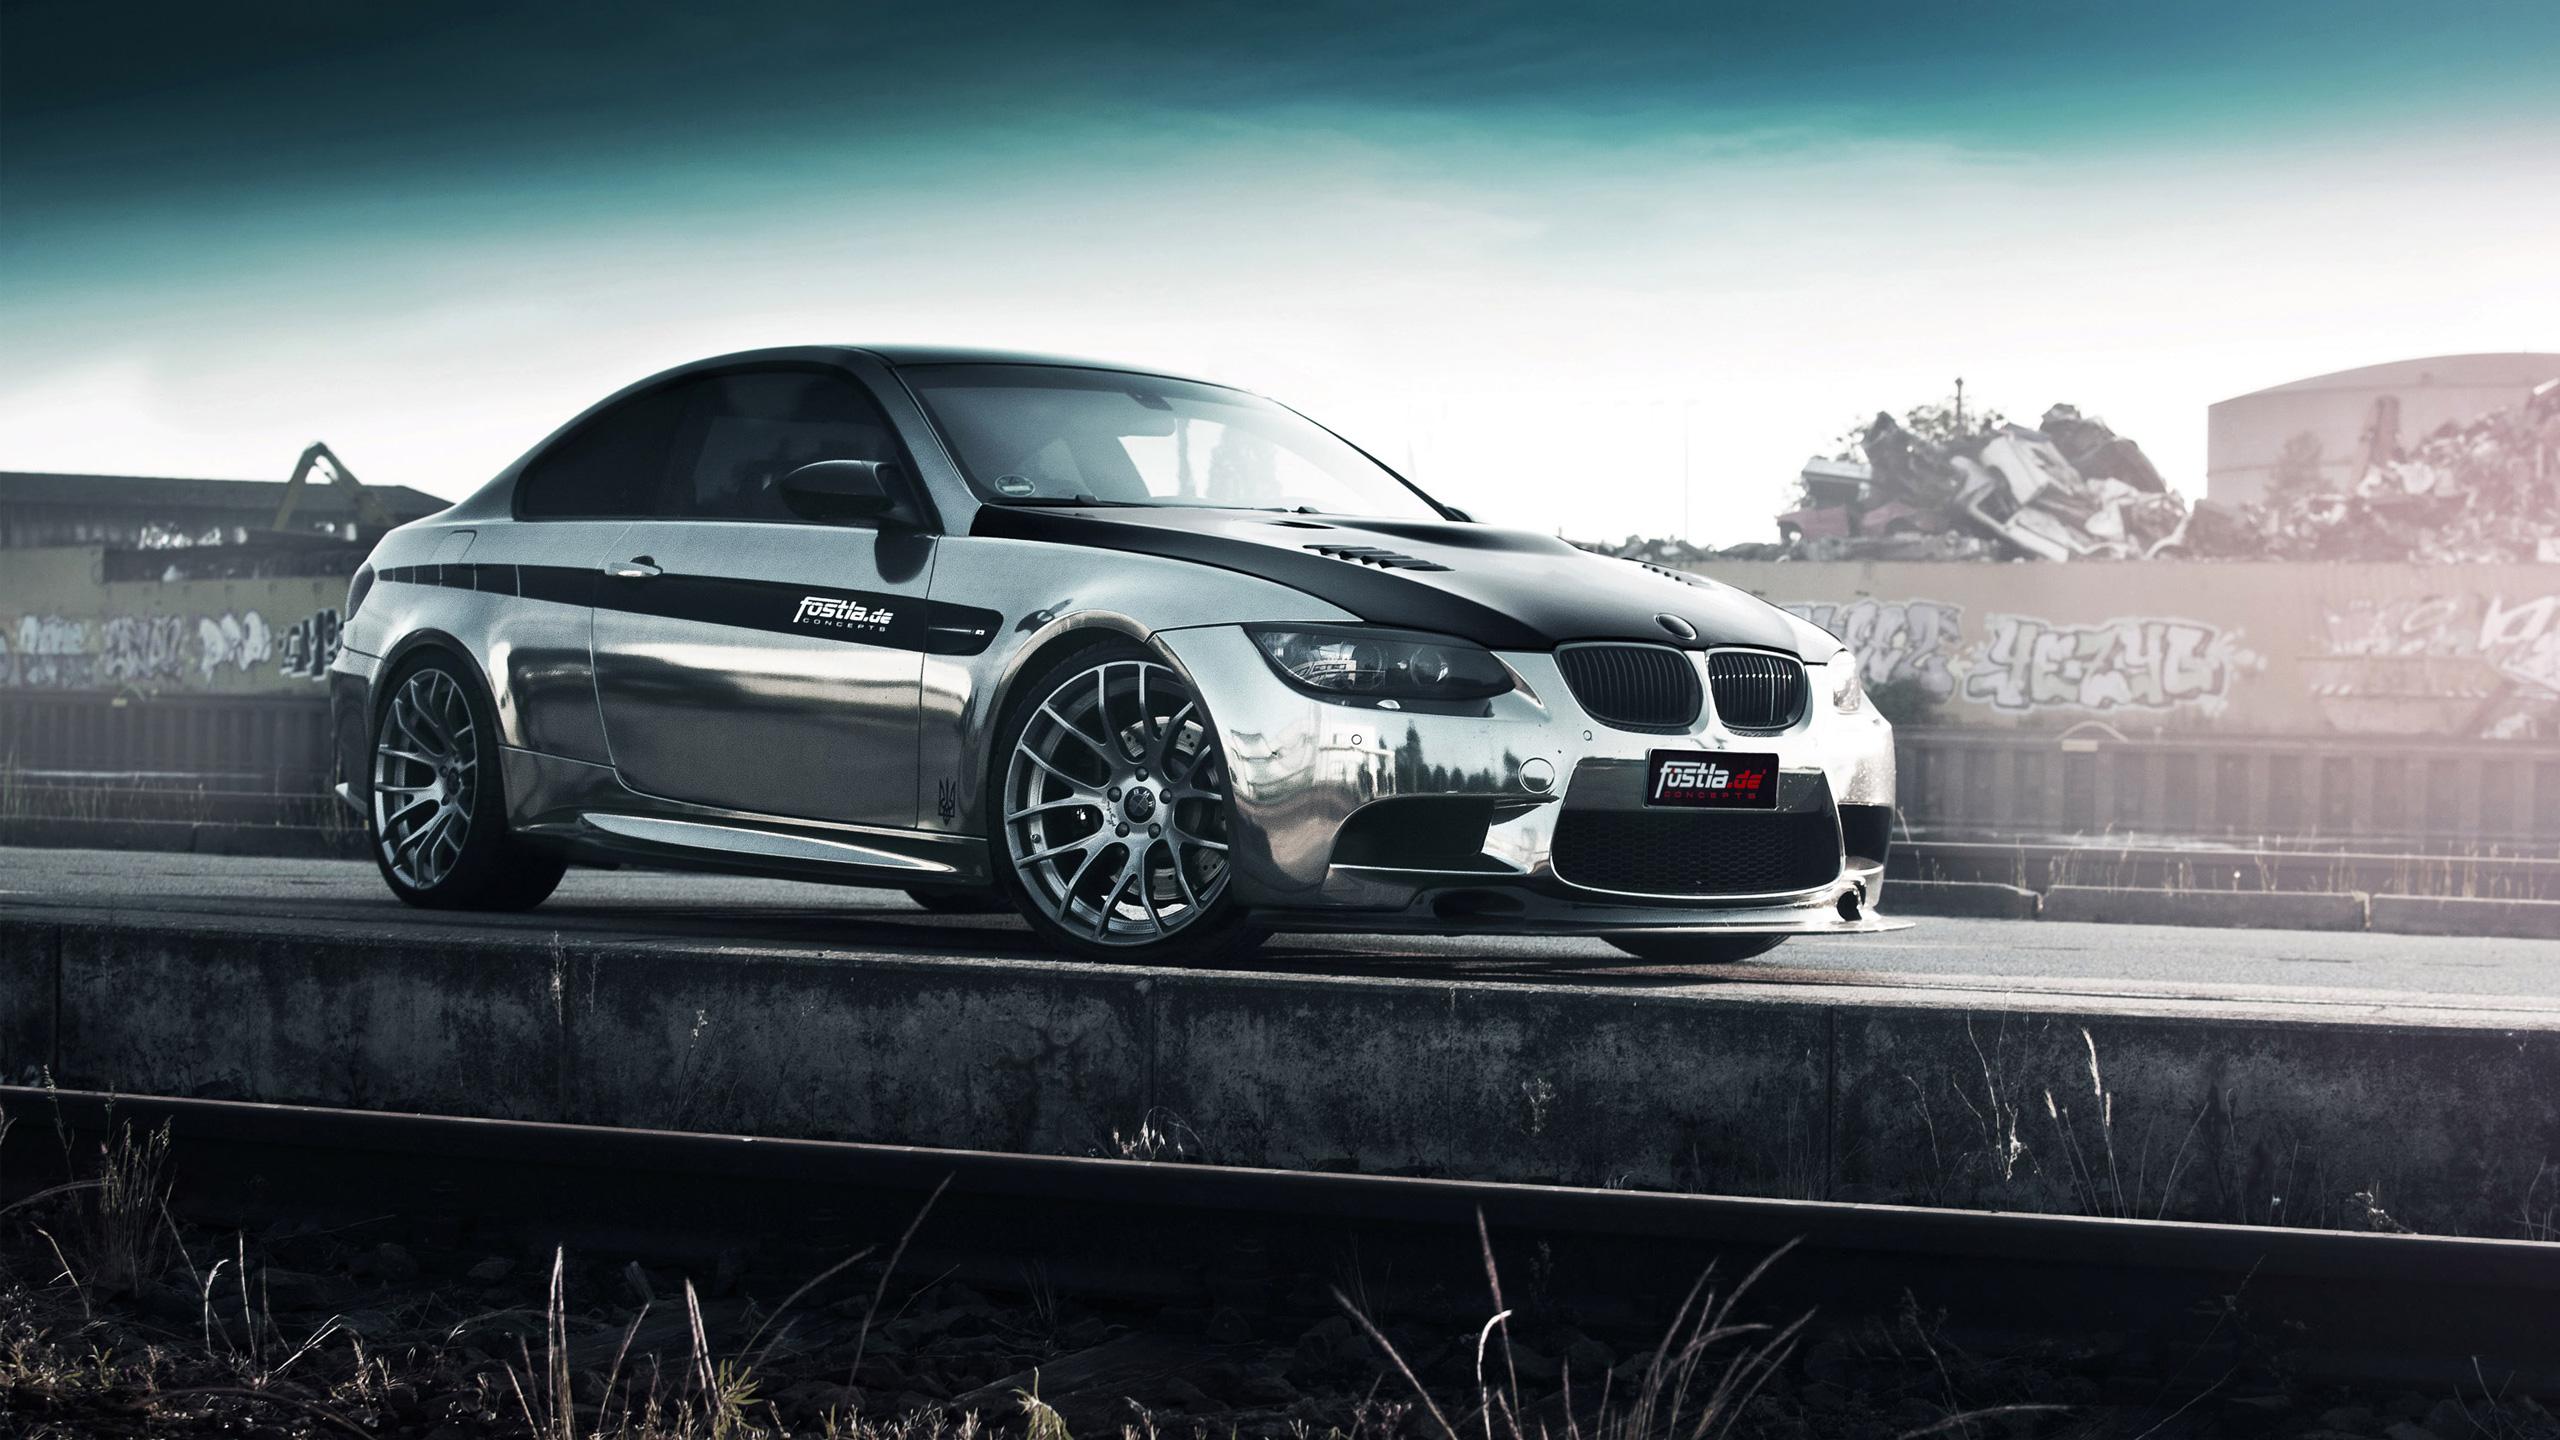 2016 Fostla de BMW M3 Coupe 2 Wallpaper HD Car Wallpapers 2560x1440